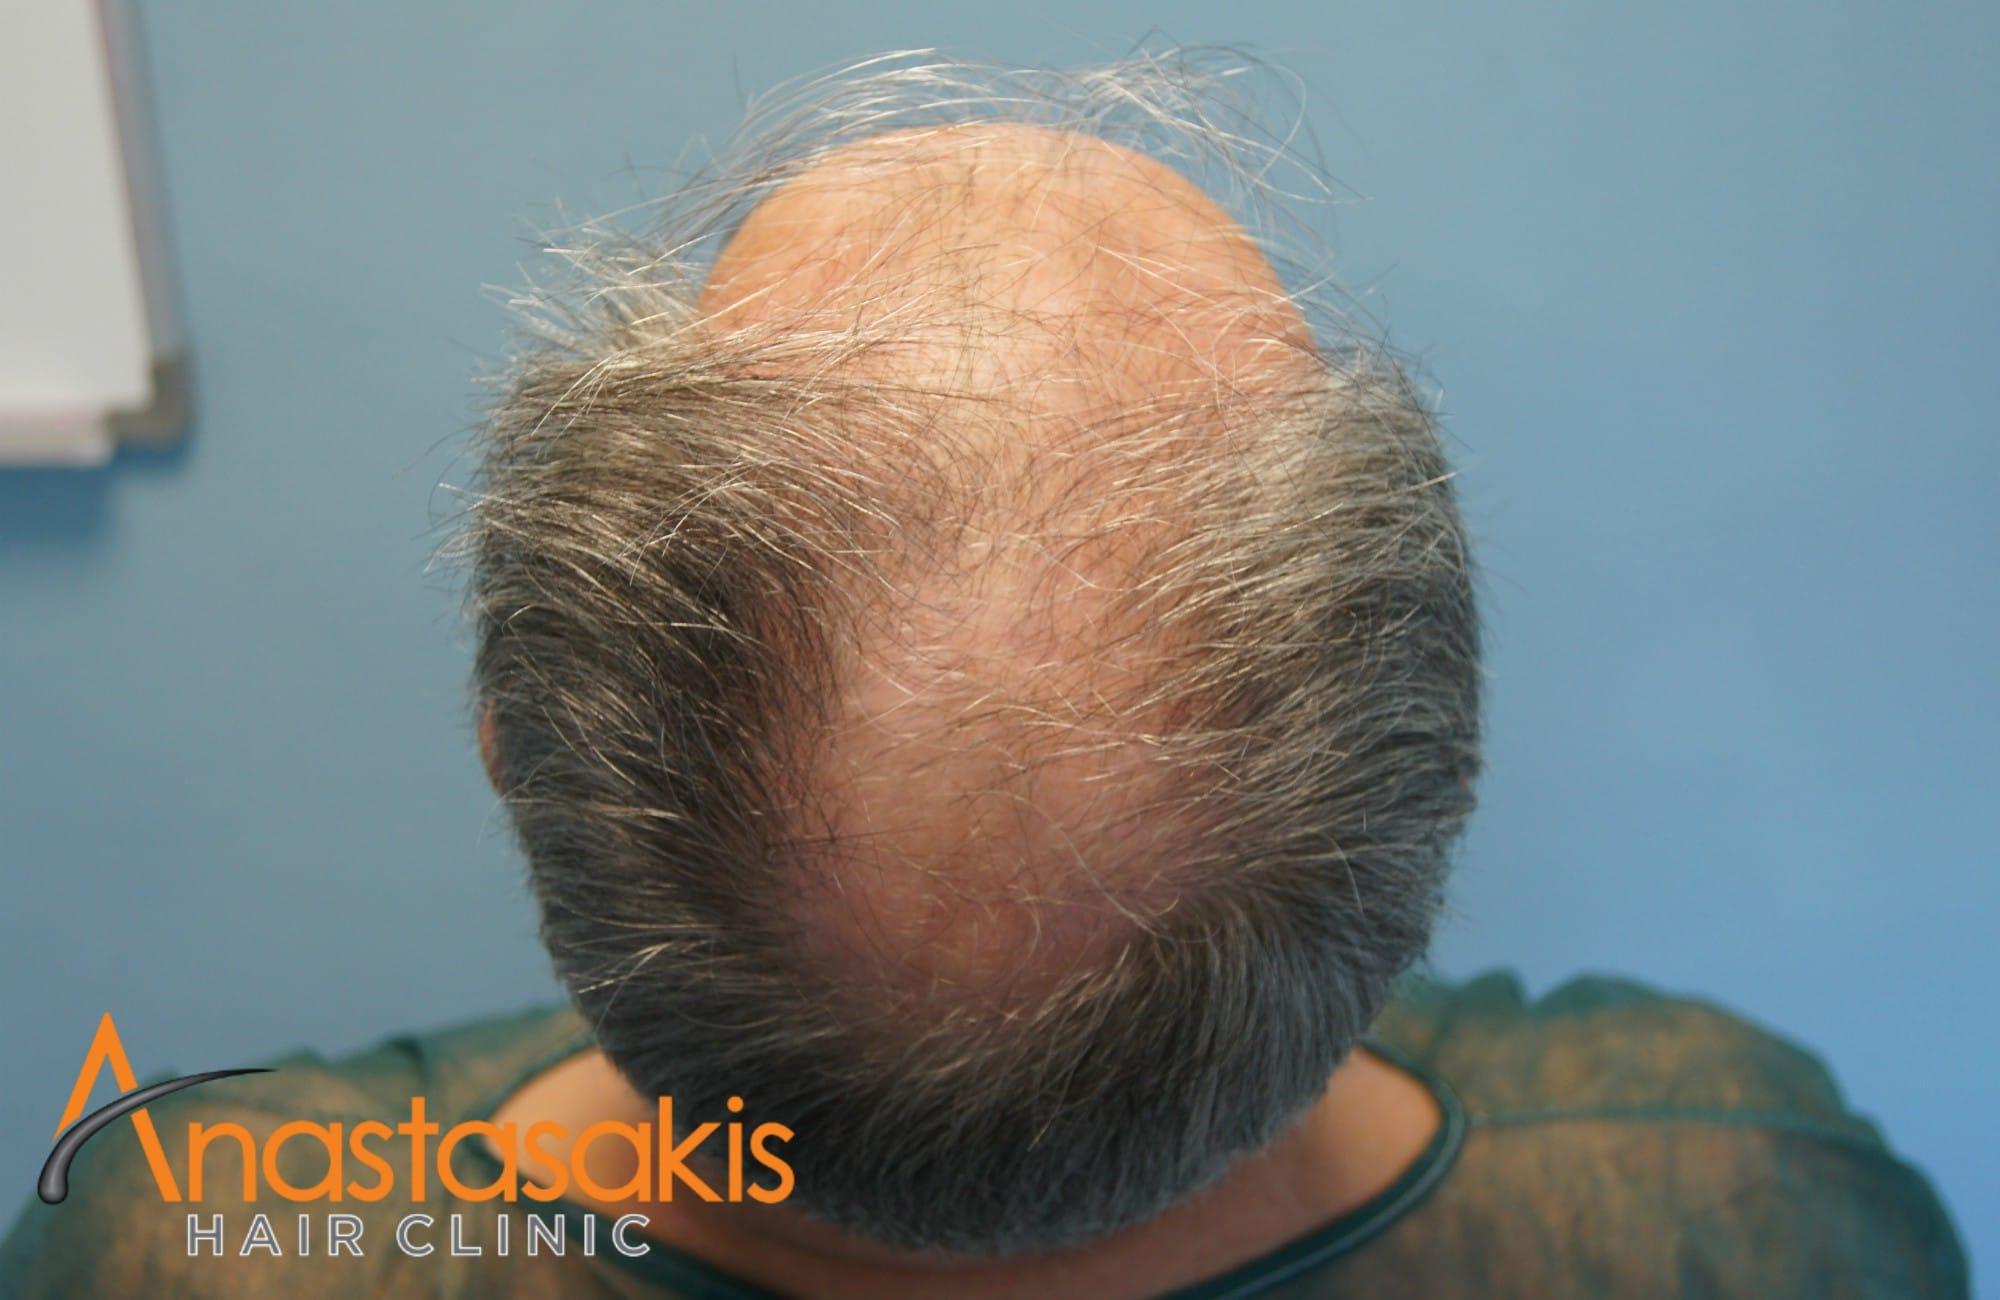 birdview ασθενους πριν τη μεταμοσχευση μαλλιων με 3650 fus